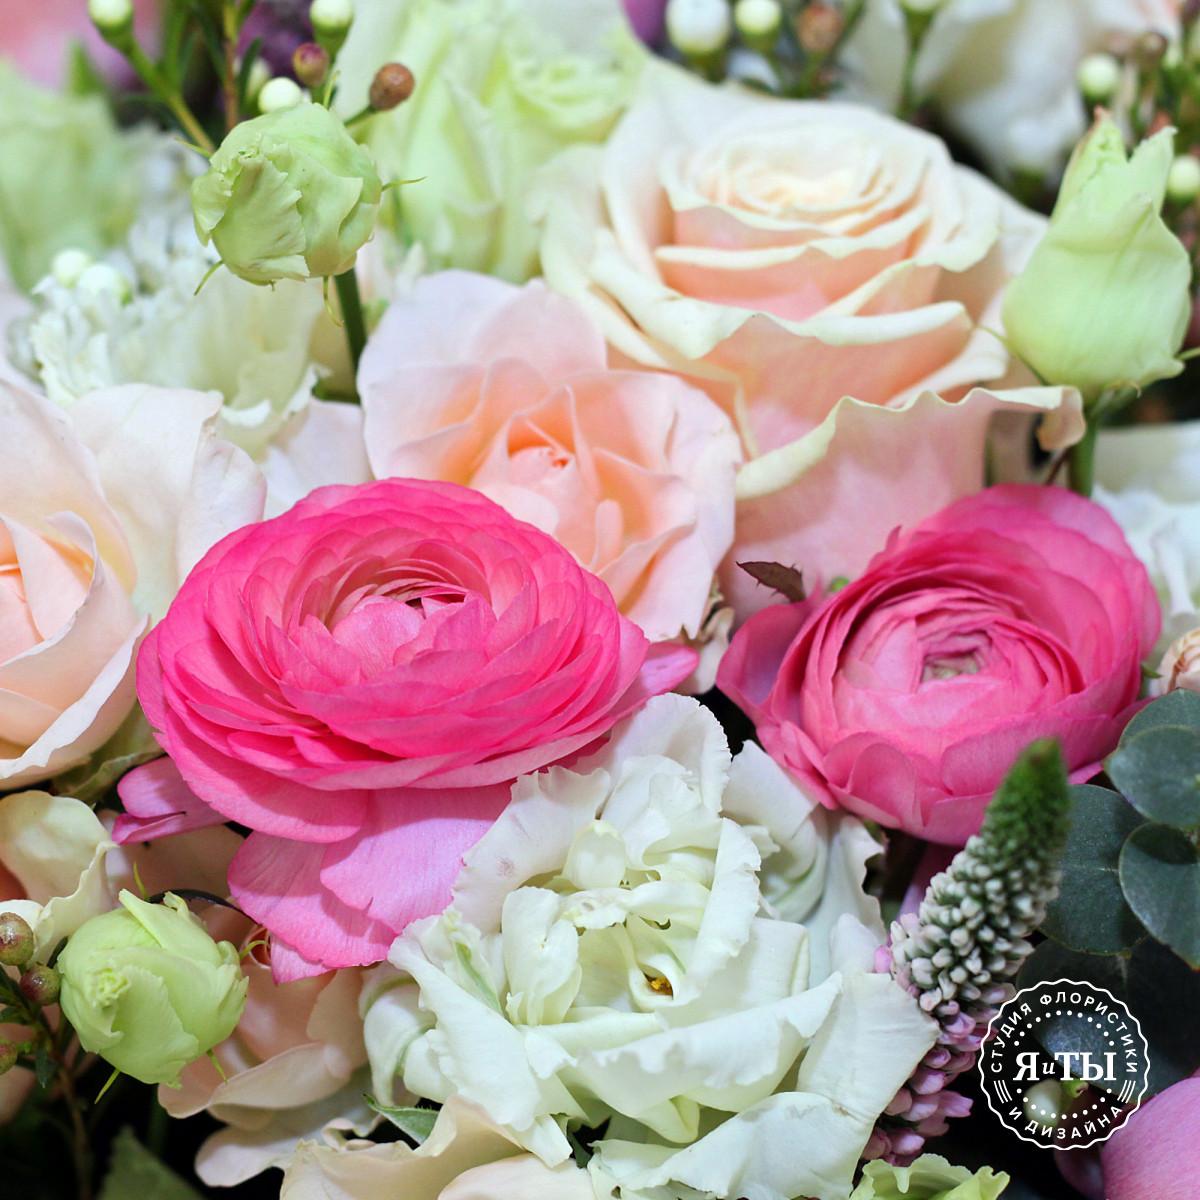 Корзина с ранункулюсами и розами